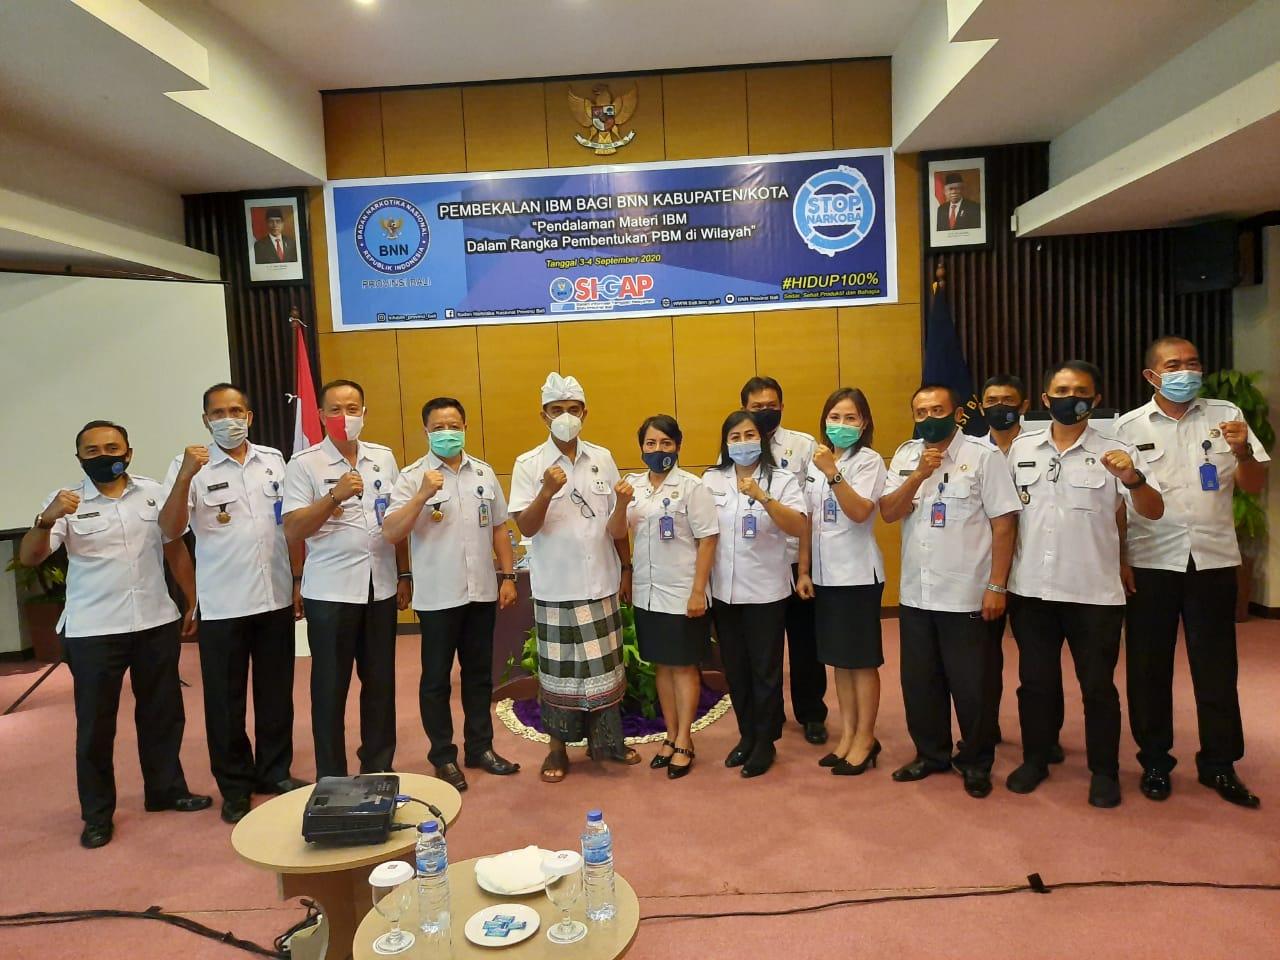 Pembukaan Pembekalan IBM Bagi BNN Kabupaten/ Kota